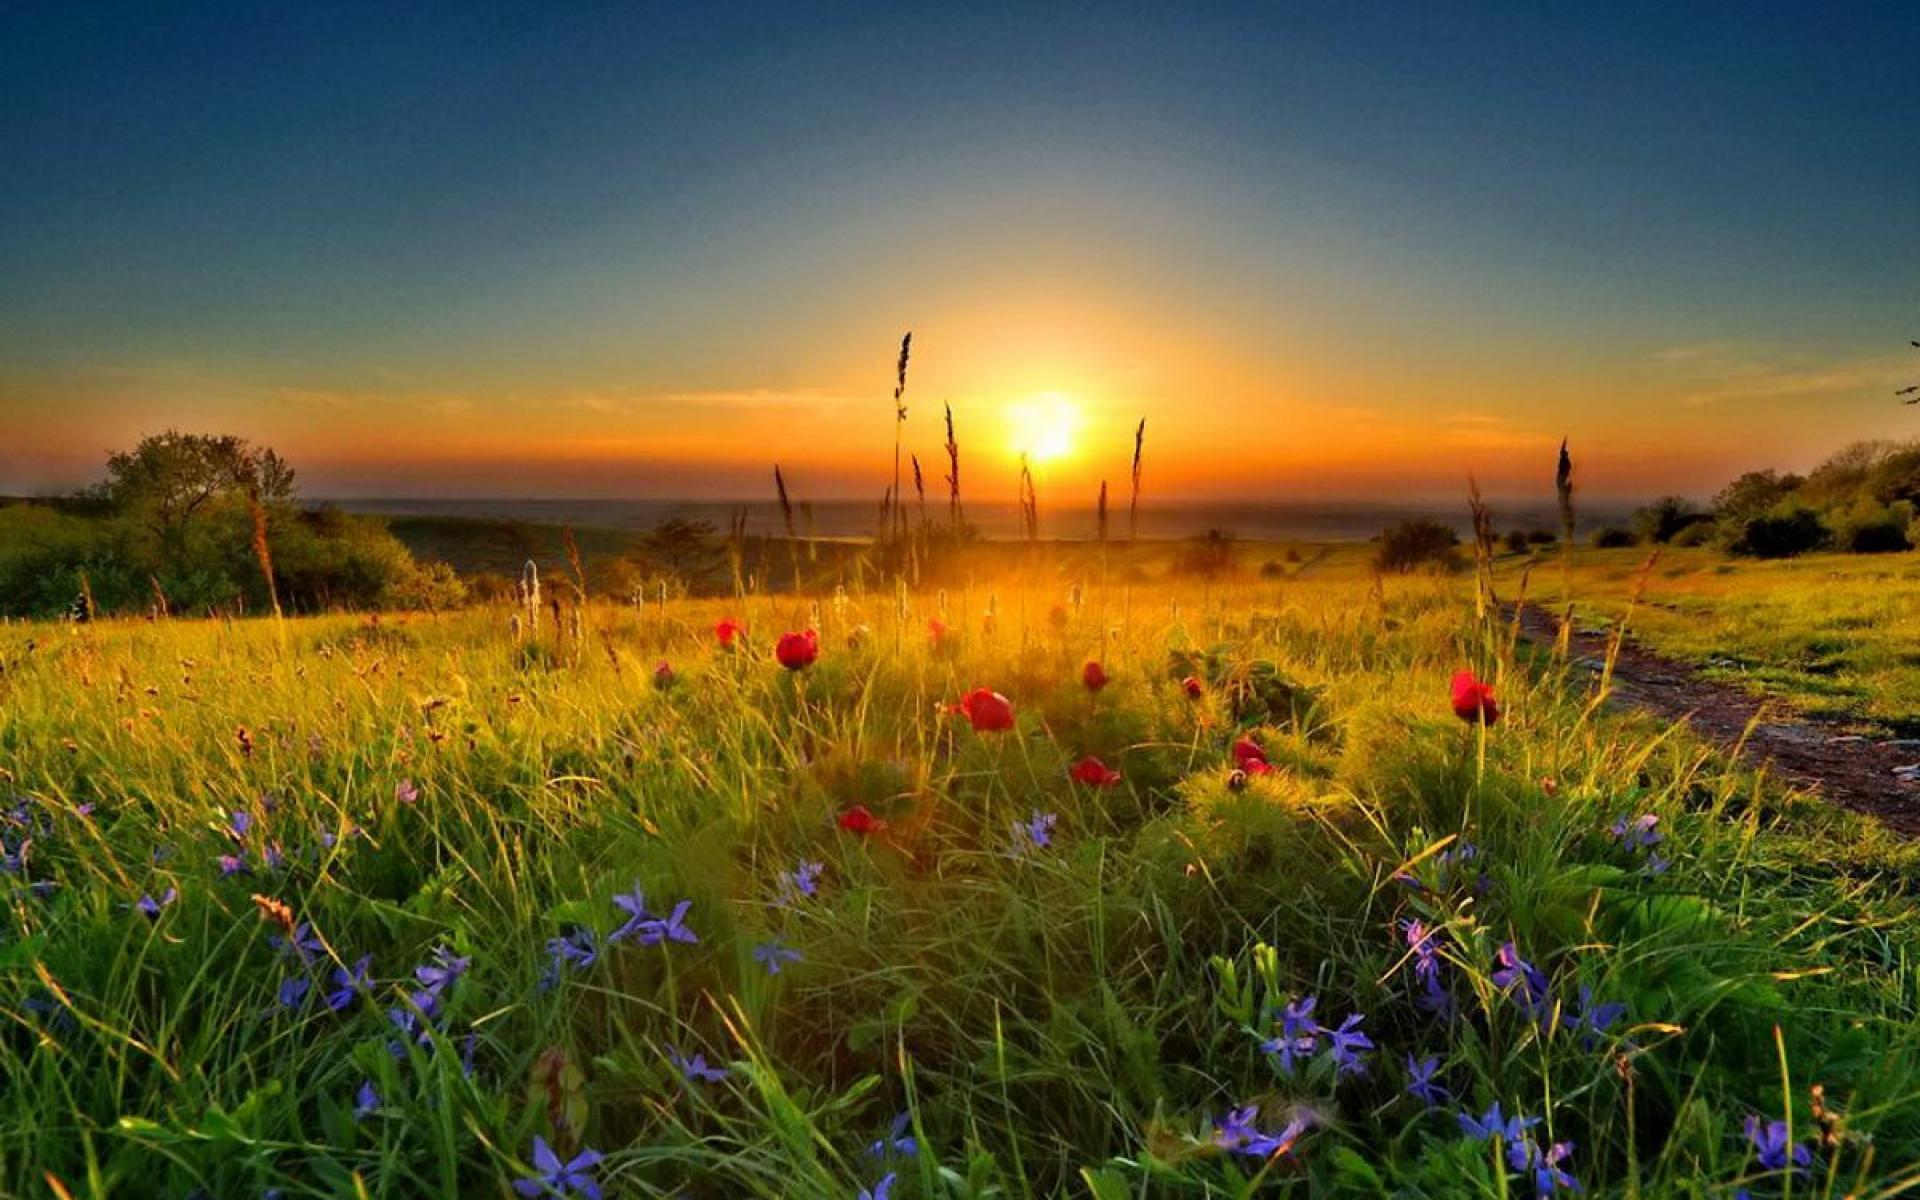 мнится восход солнца в поле фото видов